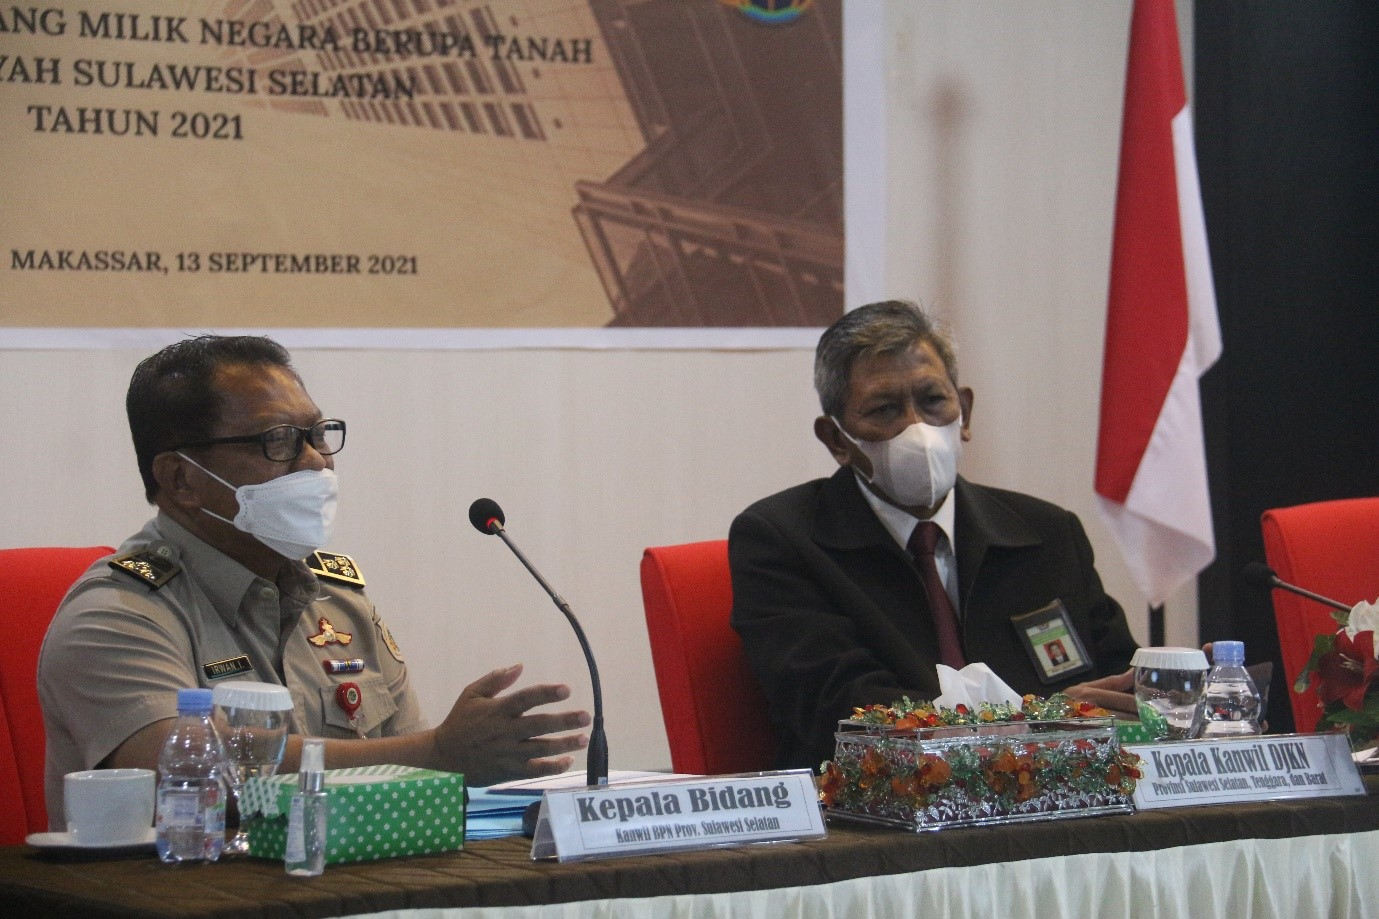 Komunikasi dan Koordinasi Kanwil DJKN Sulseltrabar-ATR/BPN Provinsi Sulawesi Selatan, Sukseskan Sertipikasi BMN Sulsel 2021